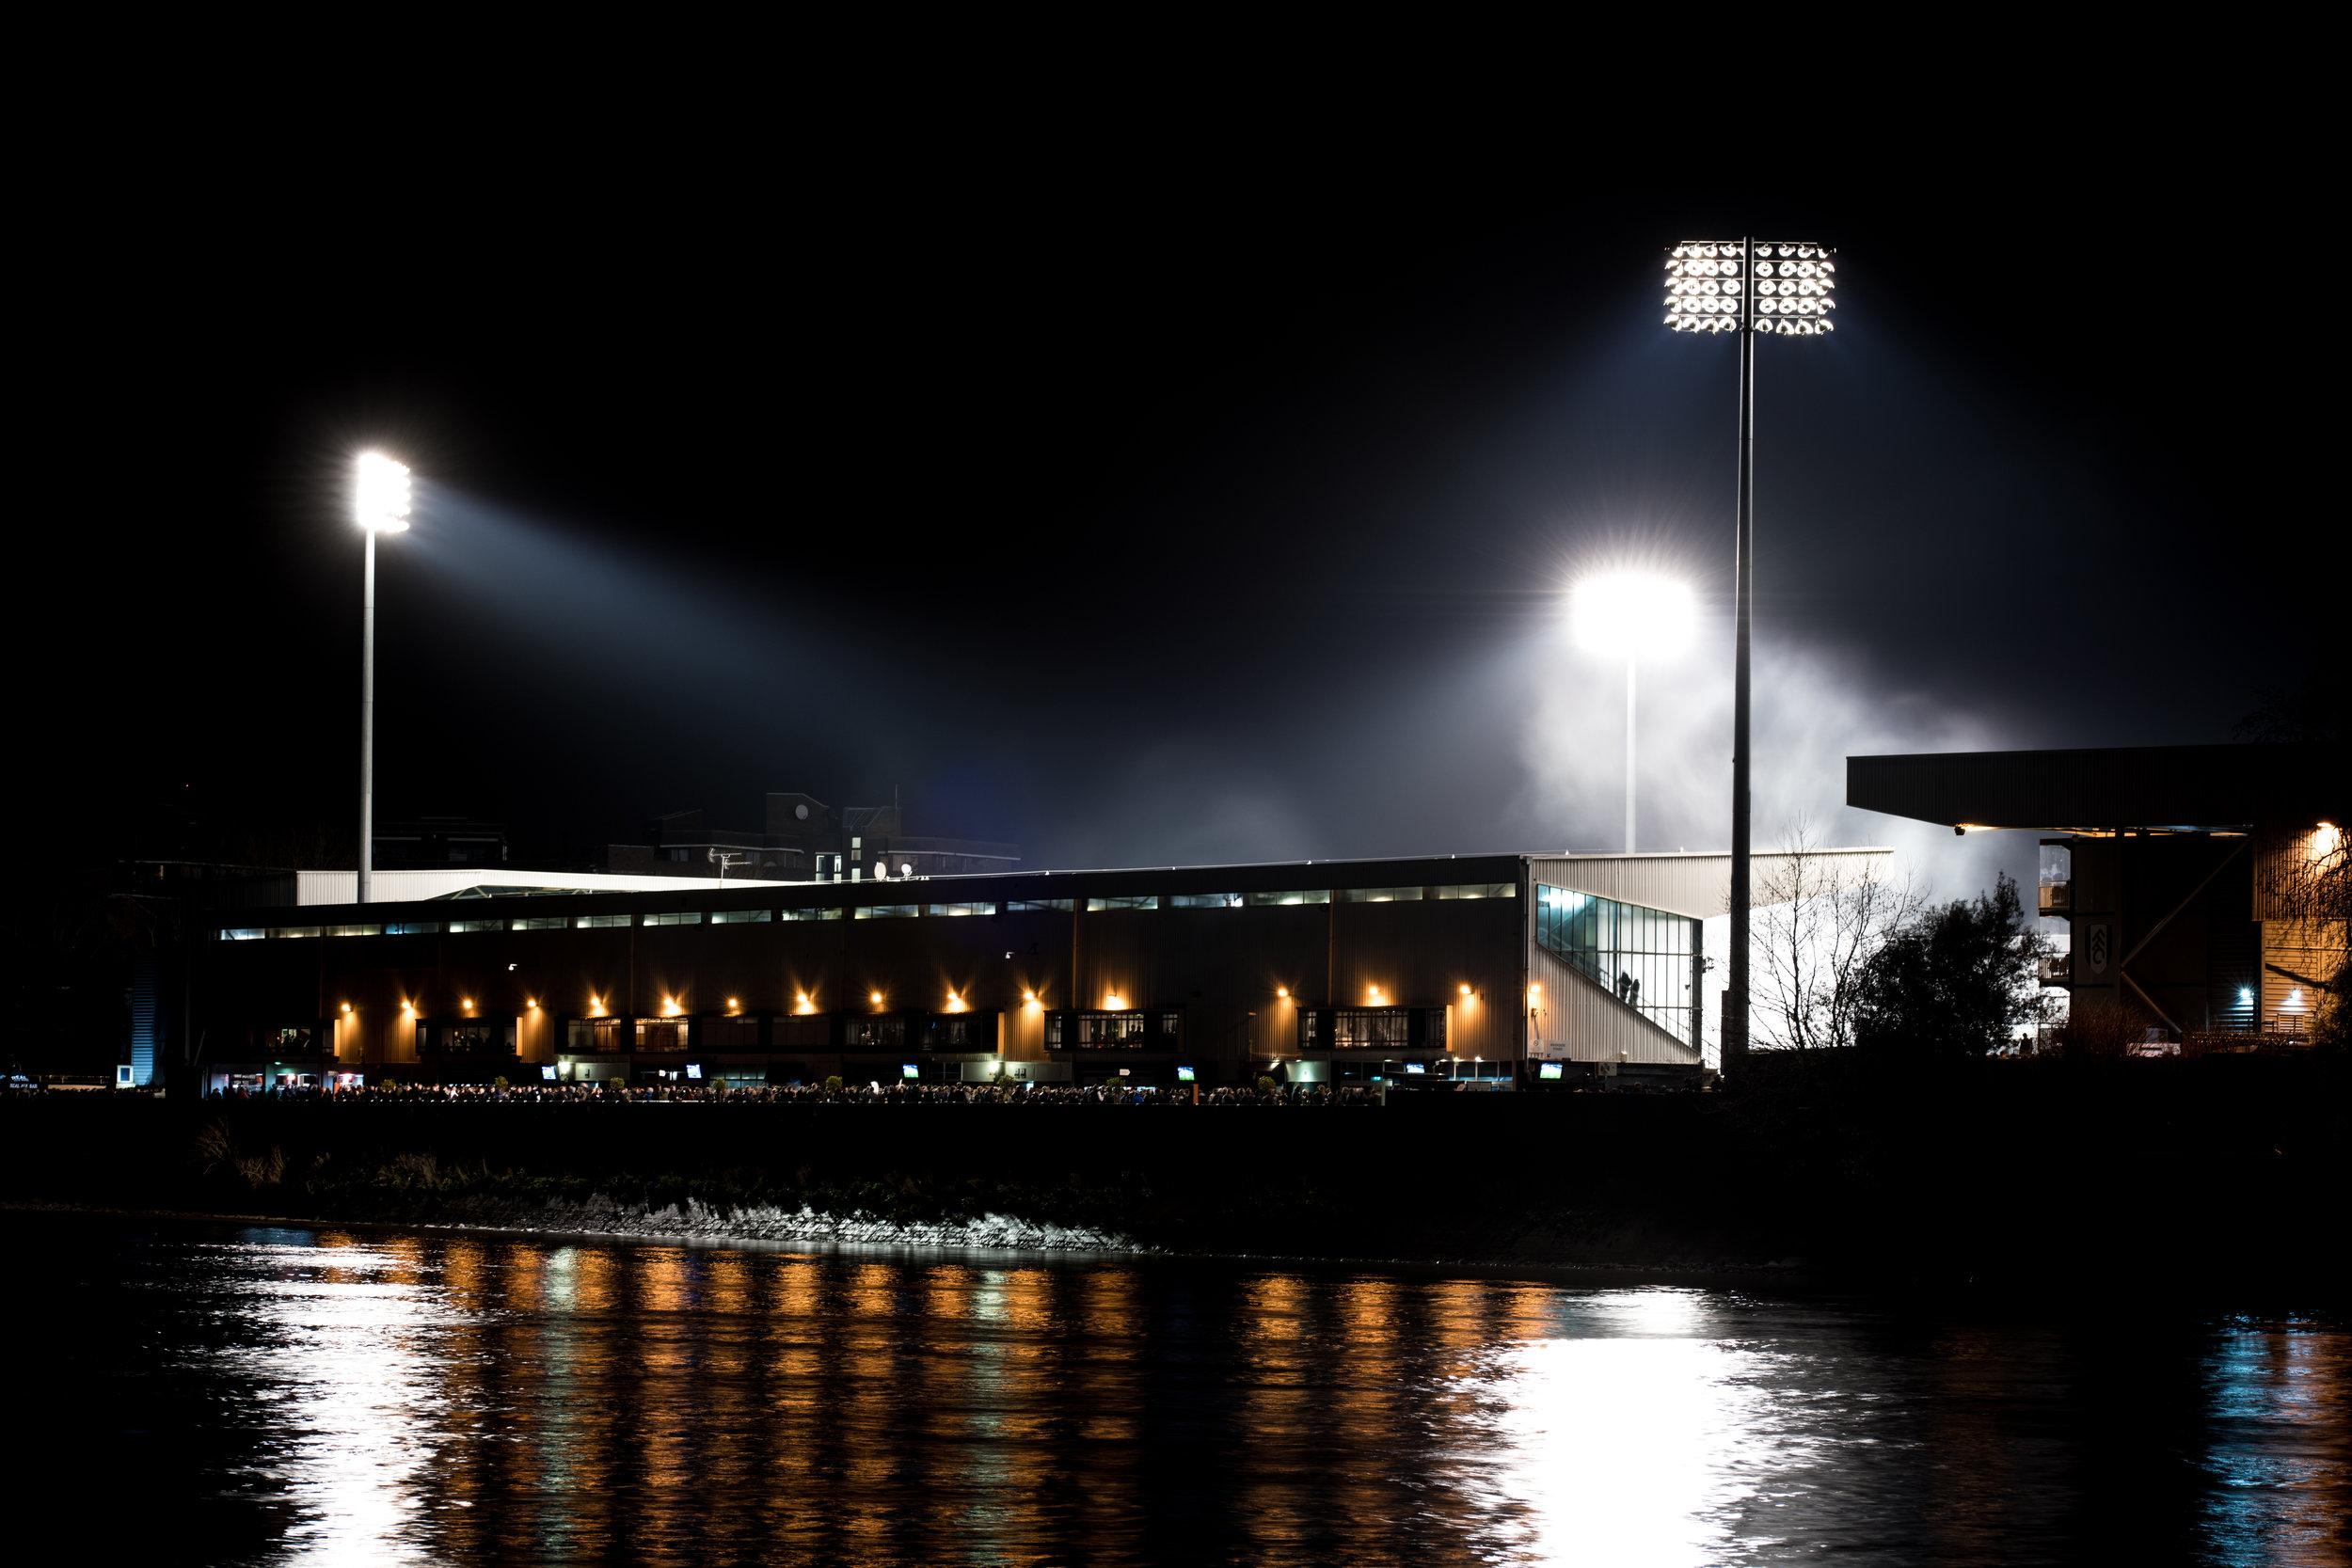 Fulham_Night (4 of 1).jpg